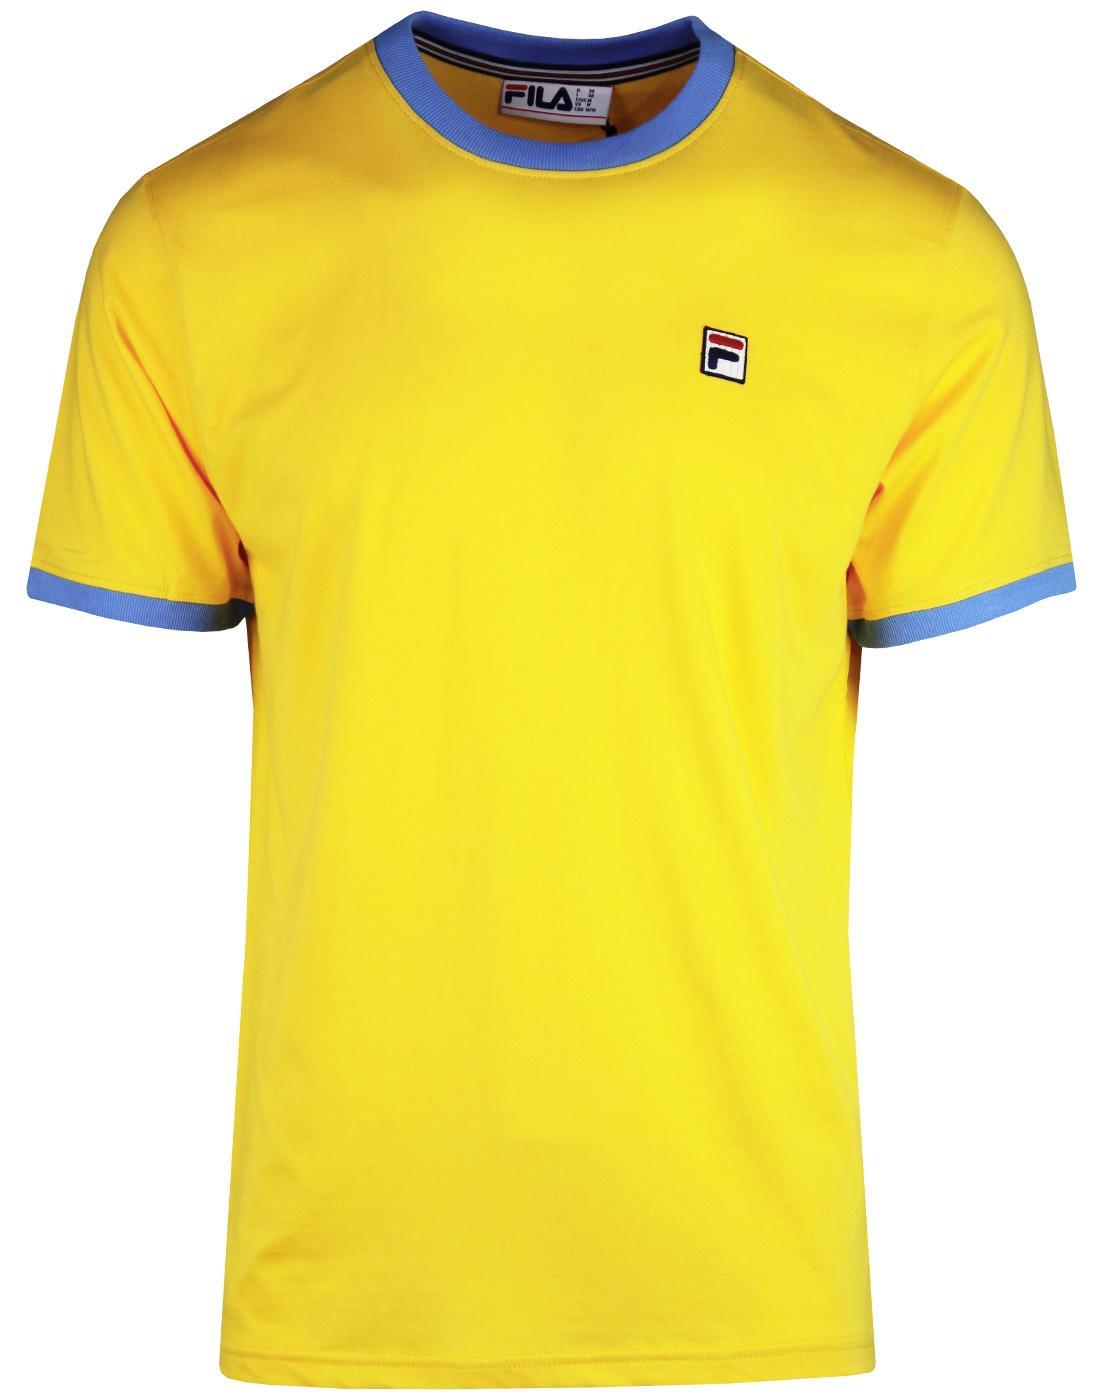 Marconi FILA VINTAGE Retro 80s Ringer T-Shirt (YC)